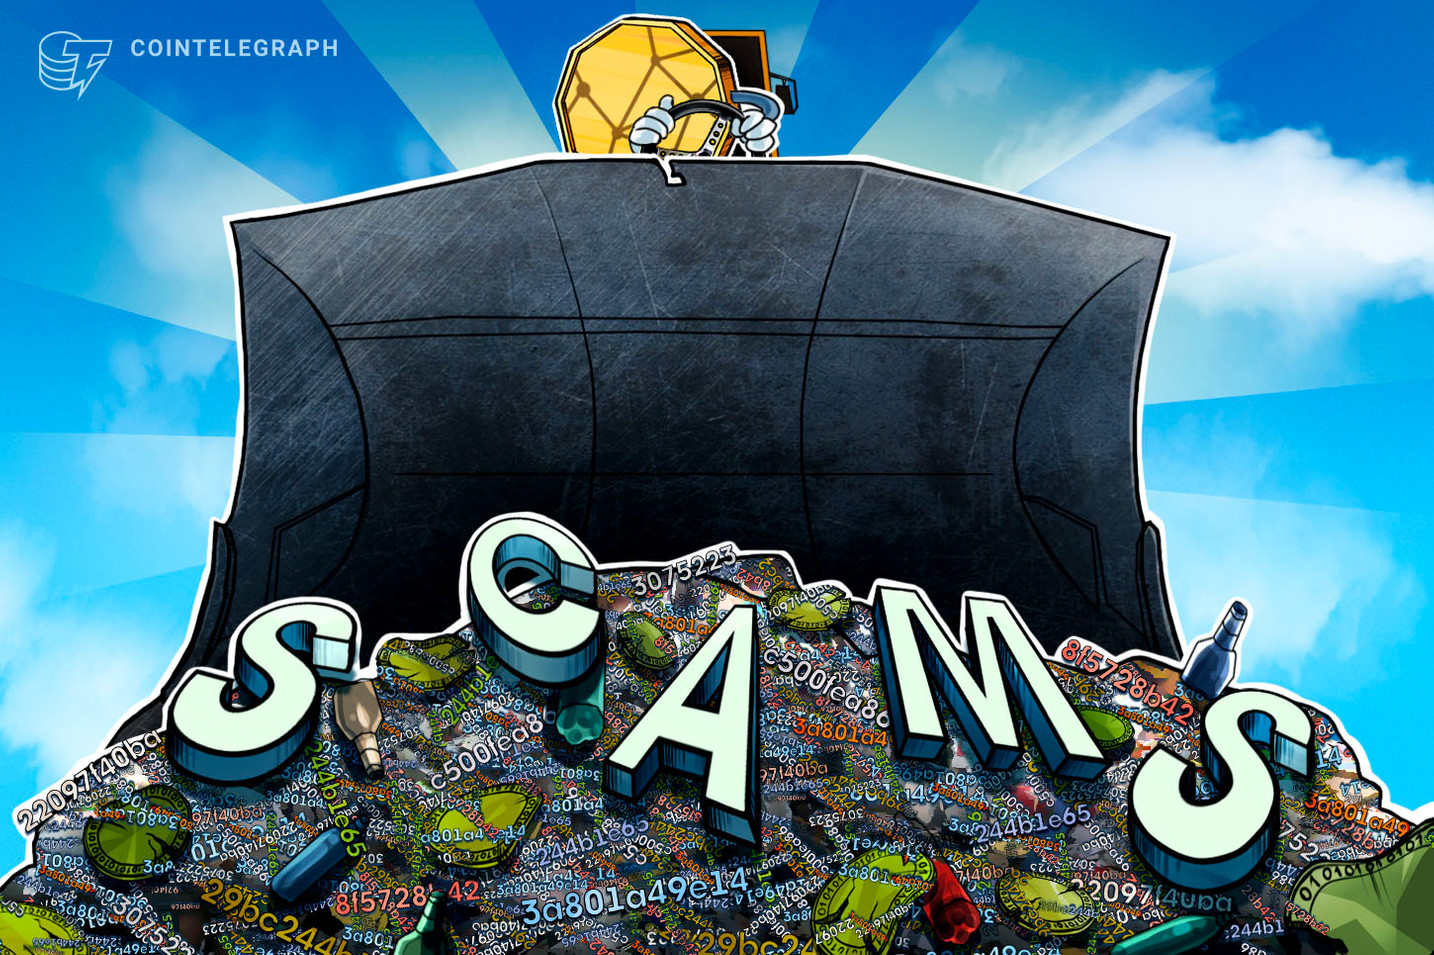 Bloomberg: Major Crypto Traders Meet to Establish Industry Blacklist, Standards